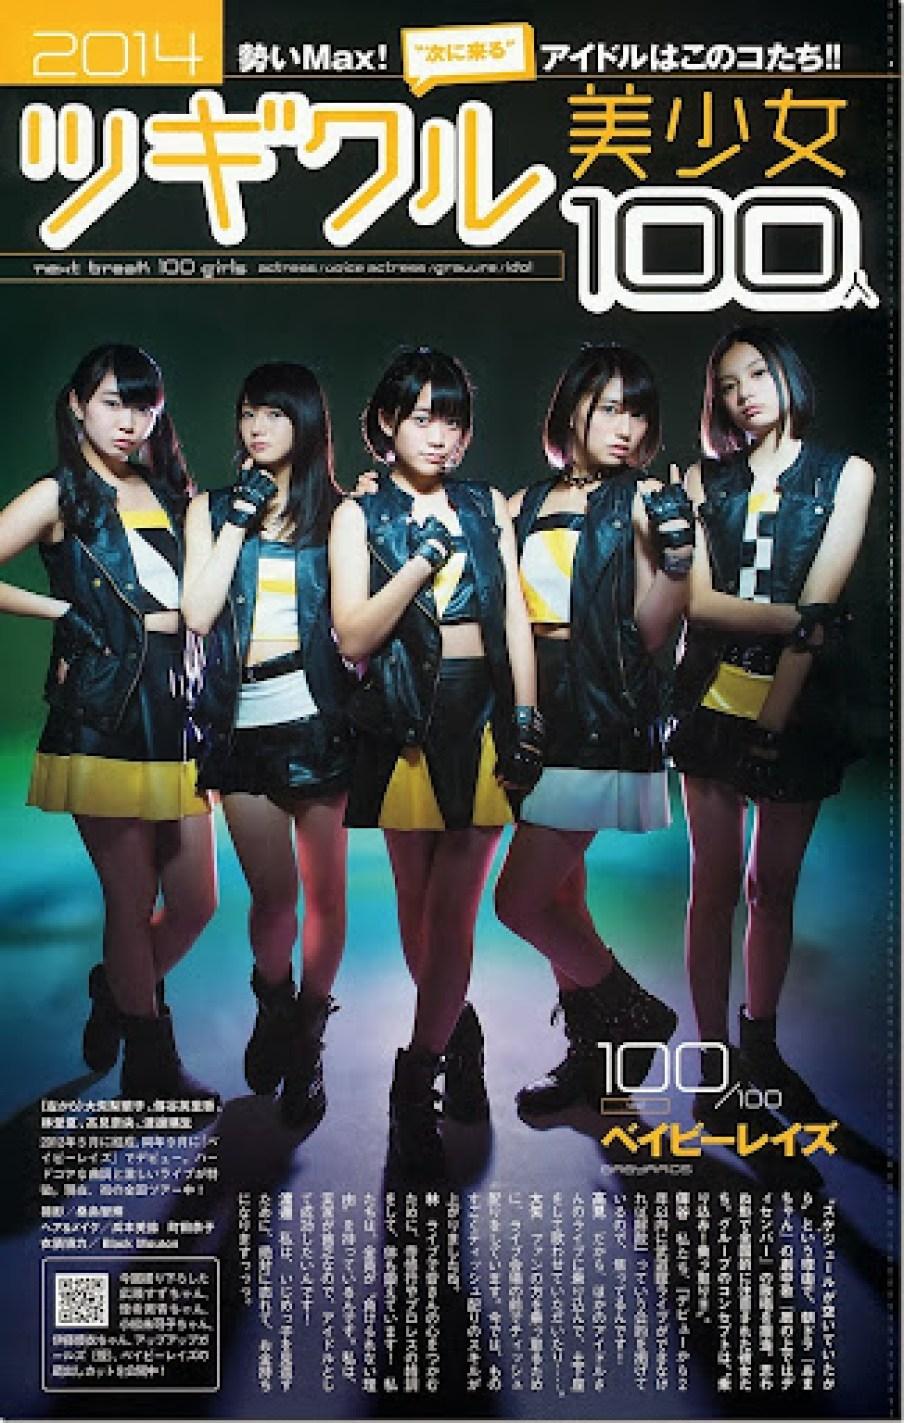 Weekly_Playboy_Magazine_IDOL_08